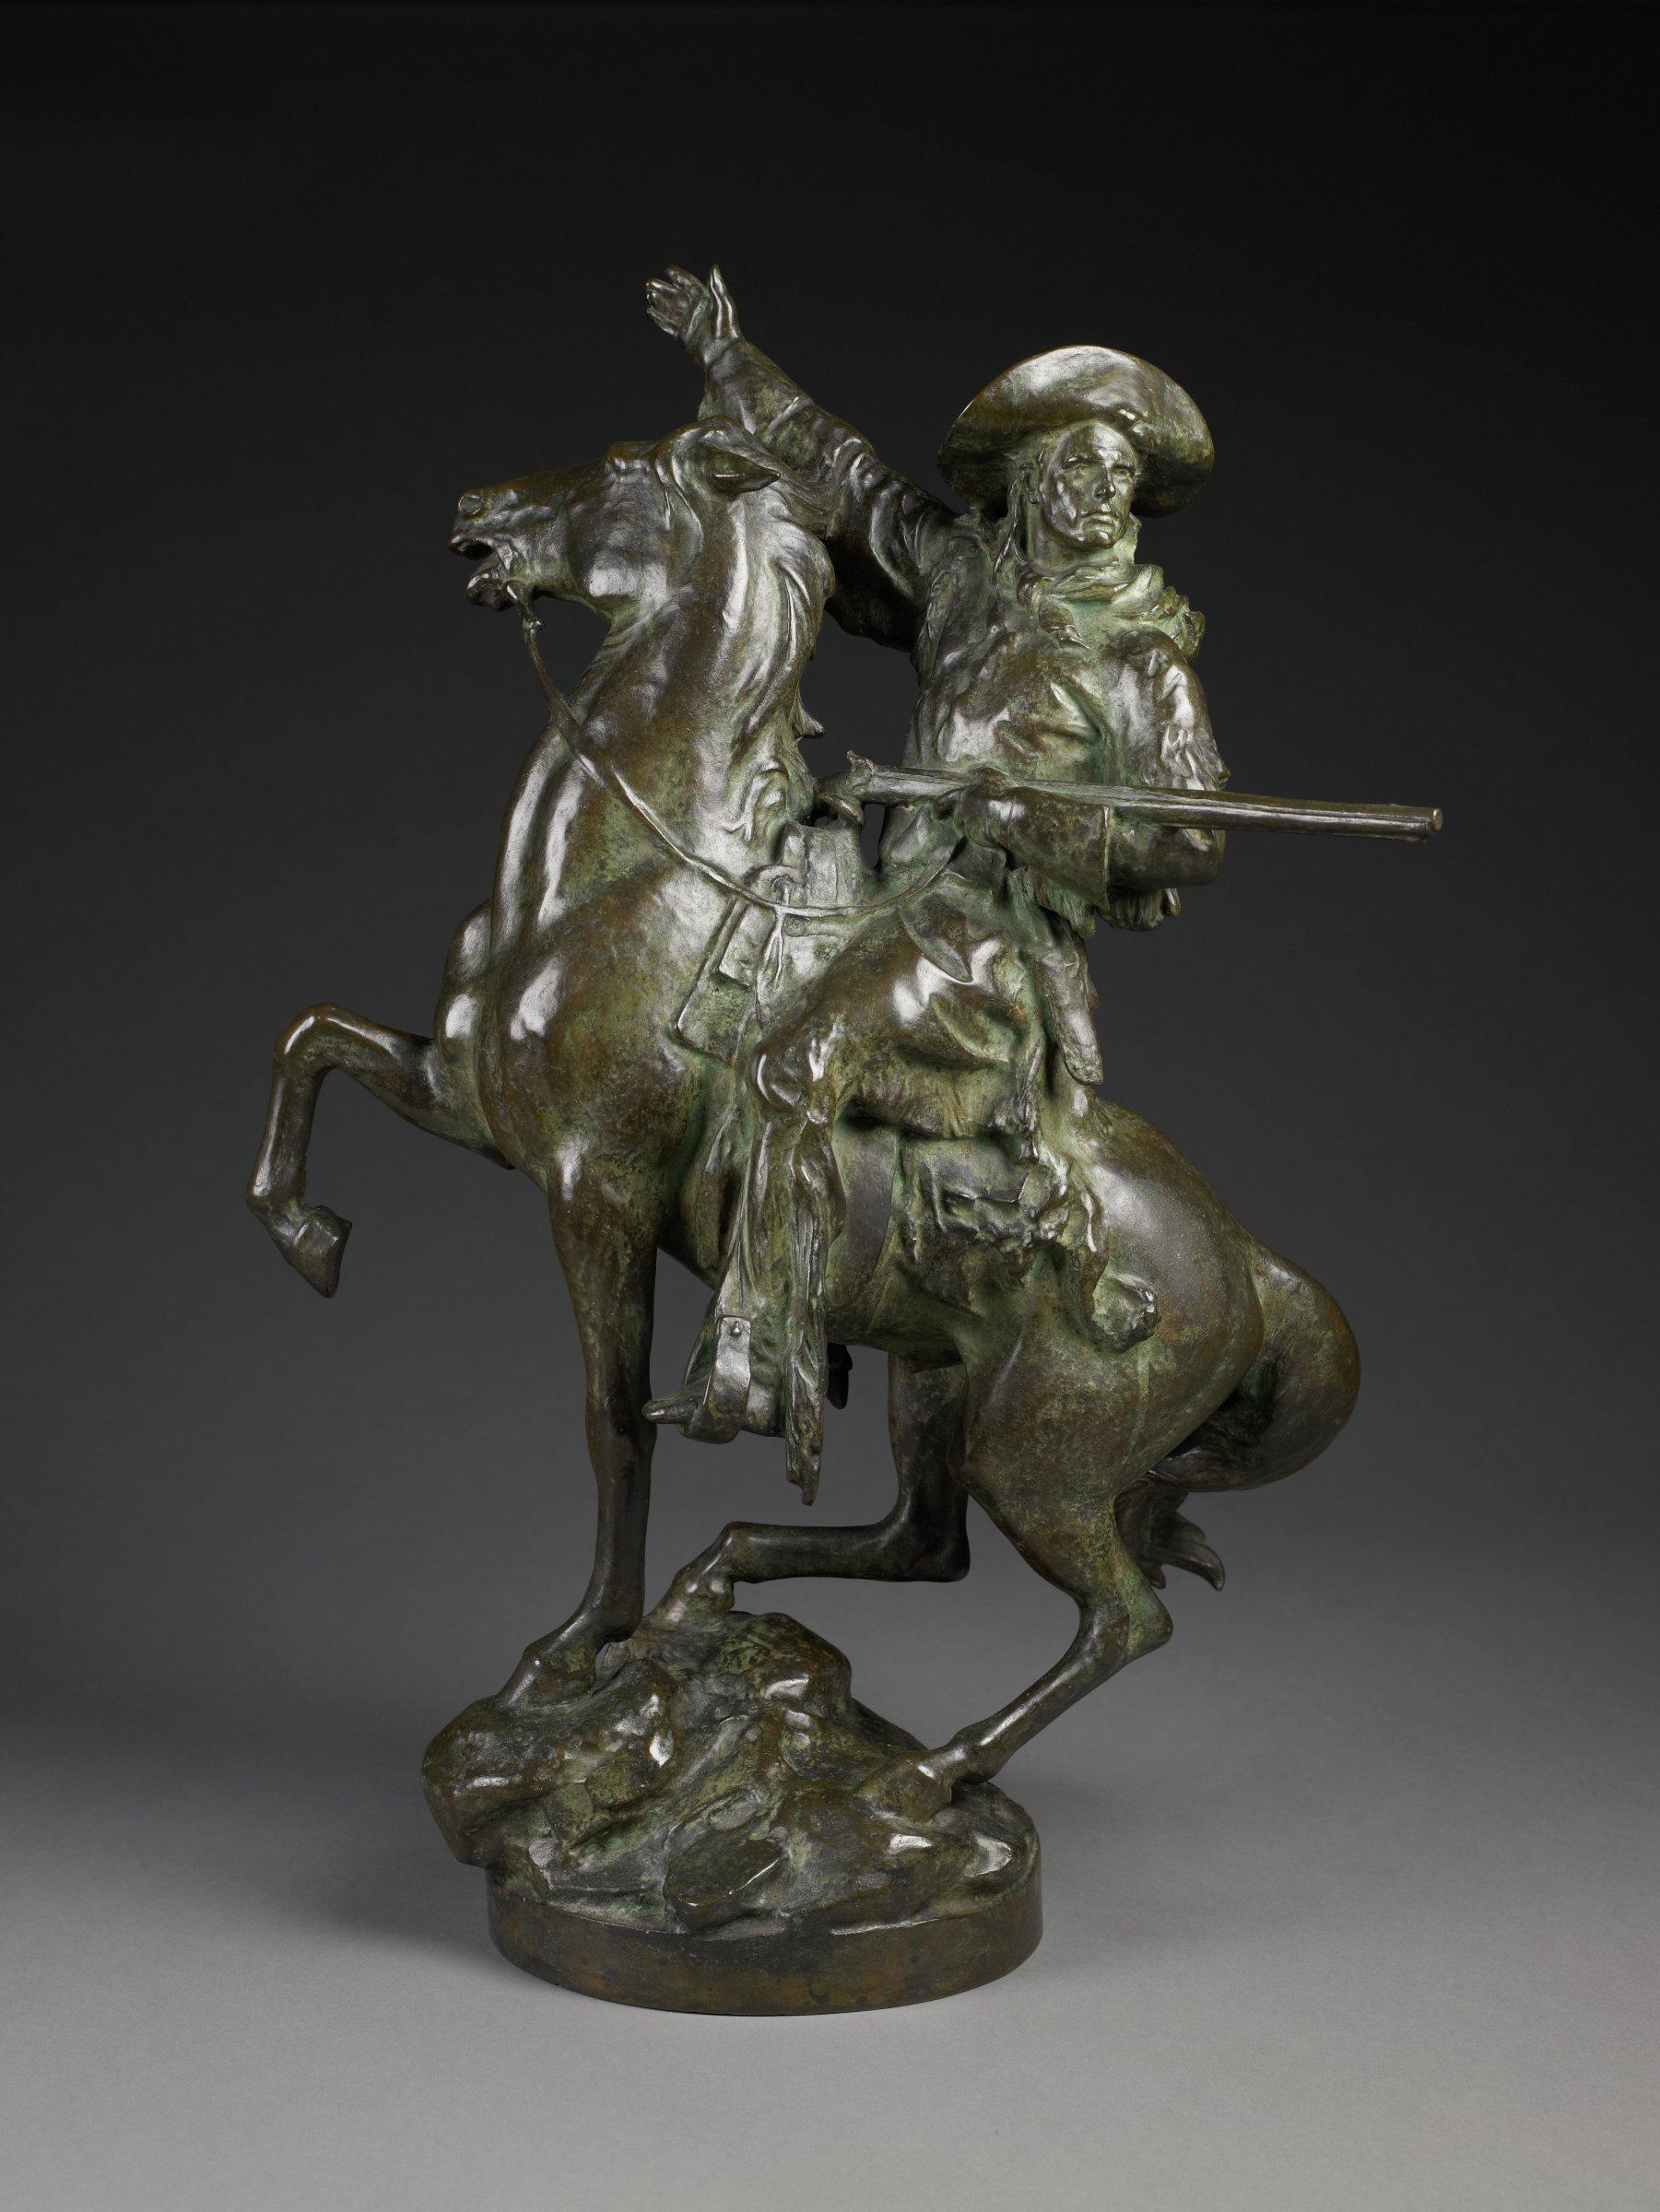 Kit Carson, Frederick William MacMonnies, Cast by Roman Bronze Works, bronze